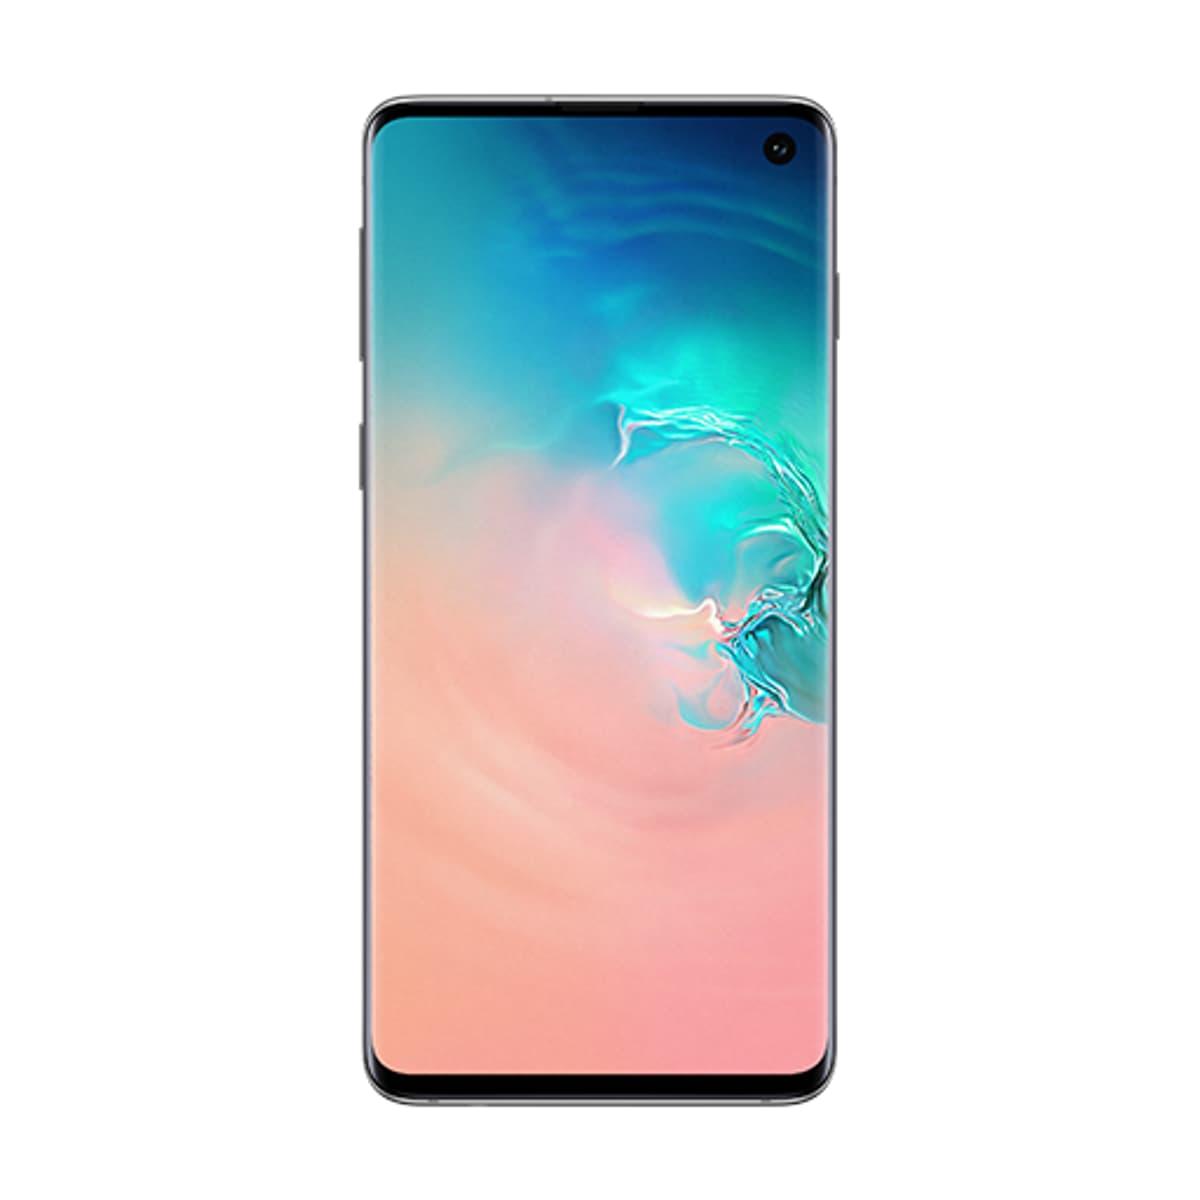 Galaxy S10 Option 1